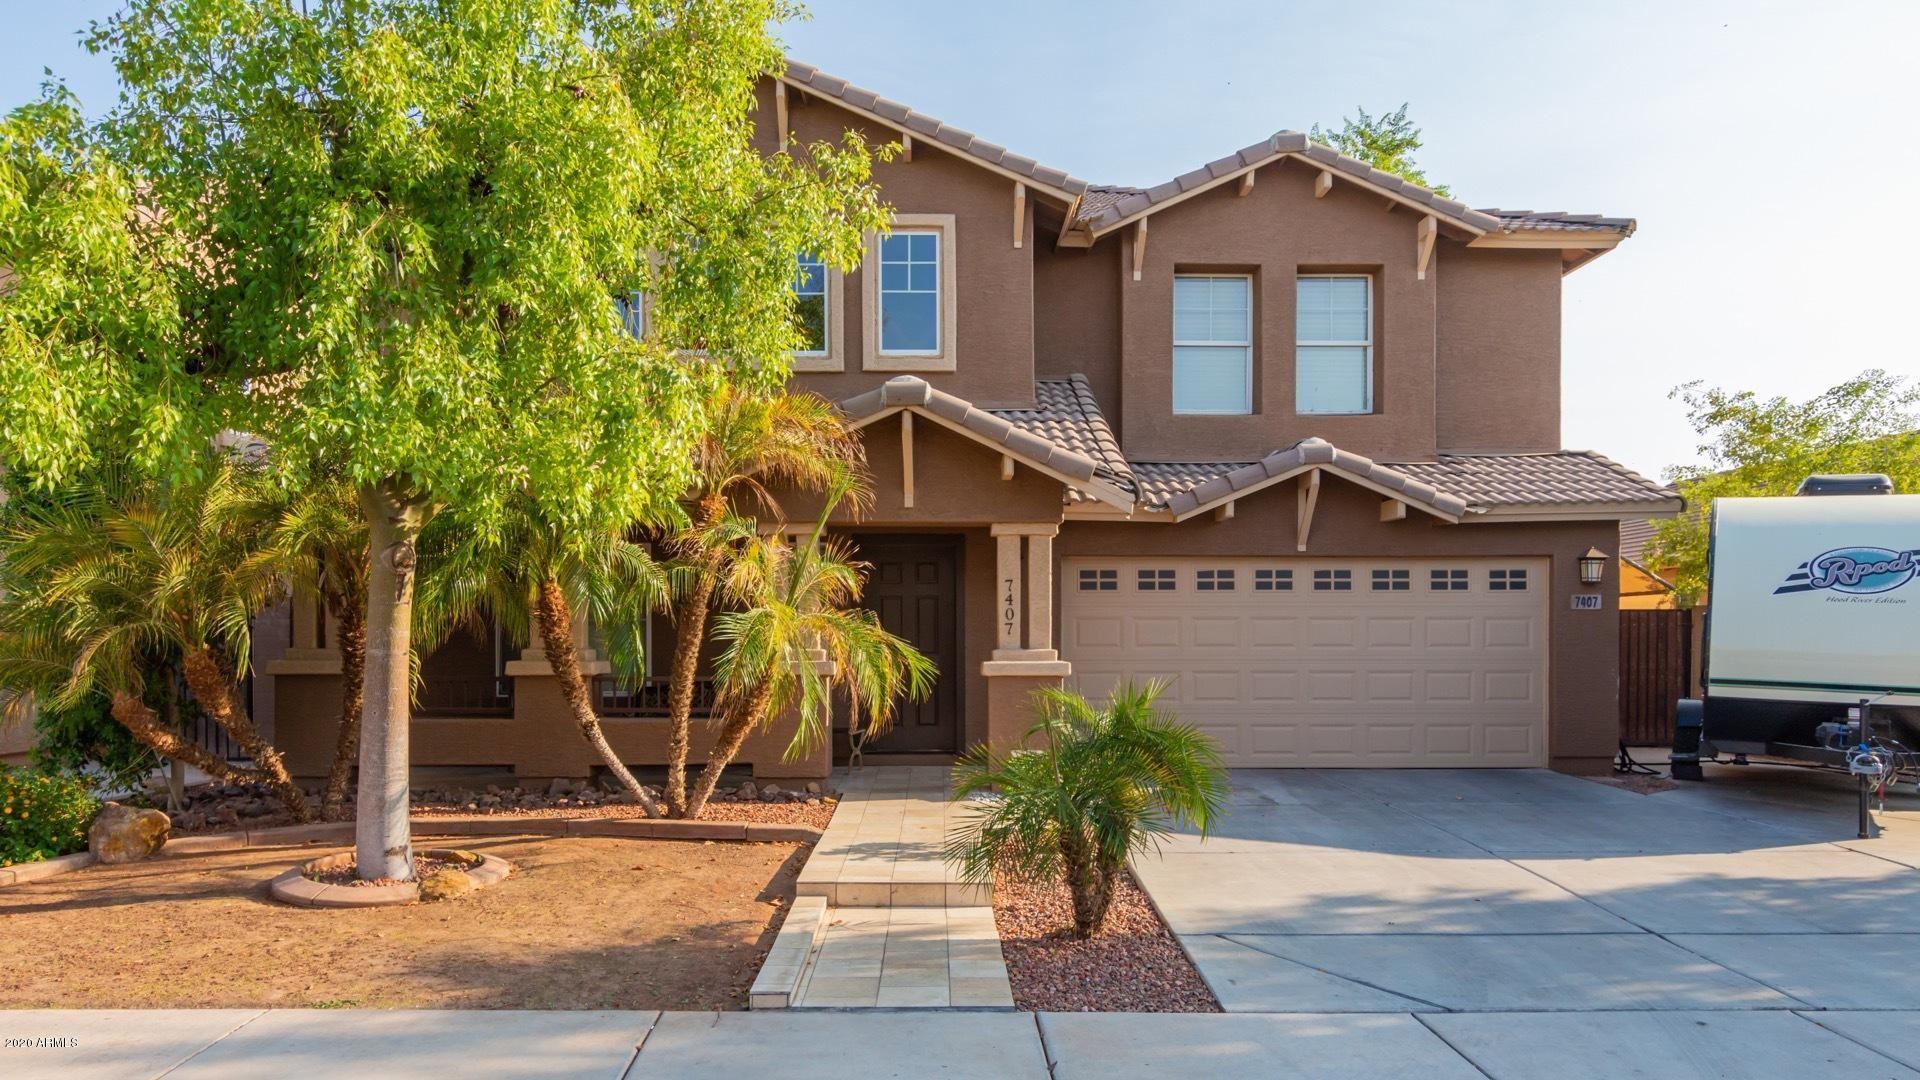 7407 W WOOD Street, Phoenix, AZ 85043 - MLS#: 6133322